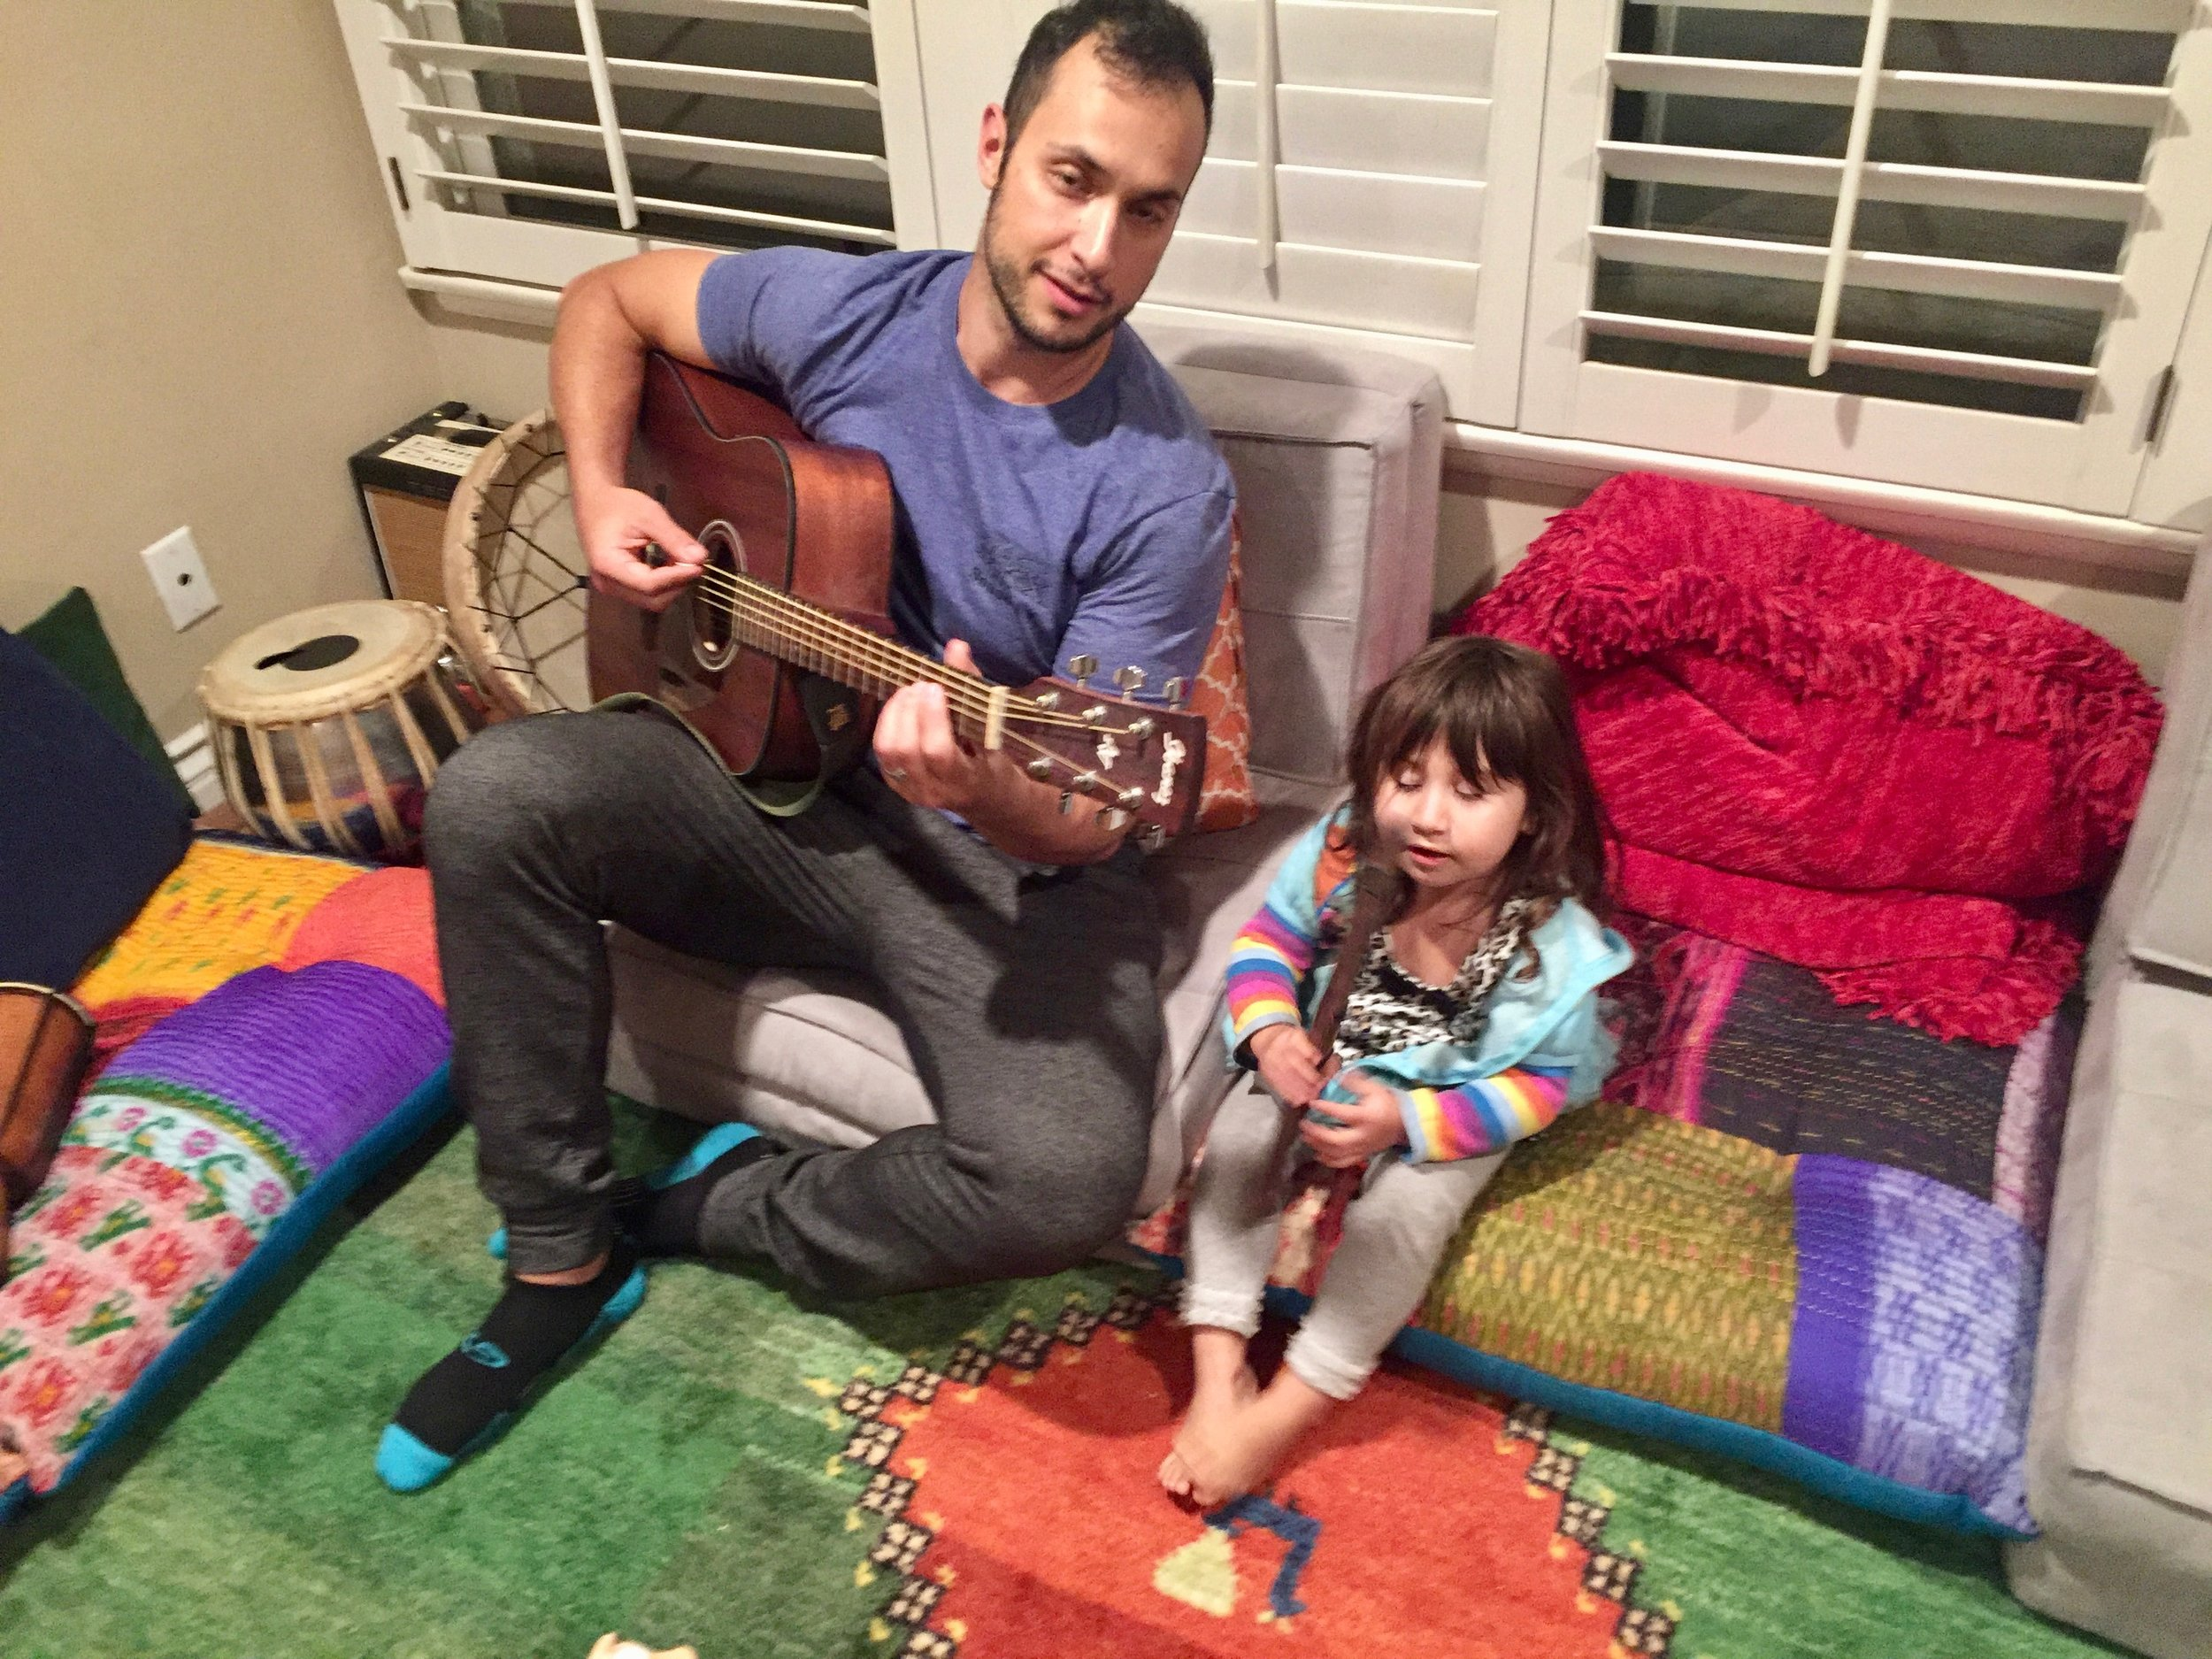 Jaylen and Leili making music.